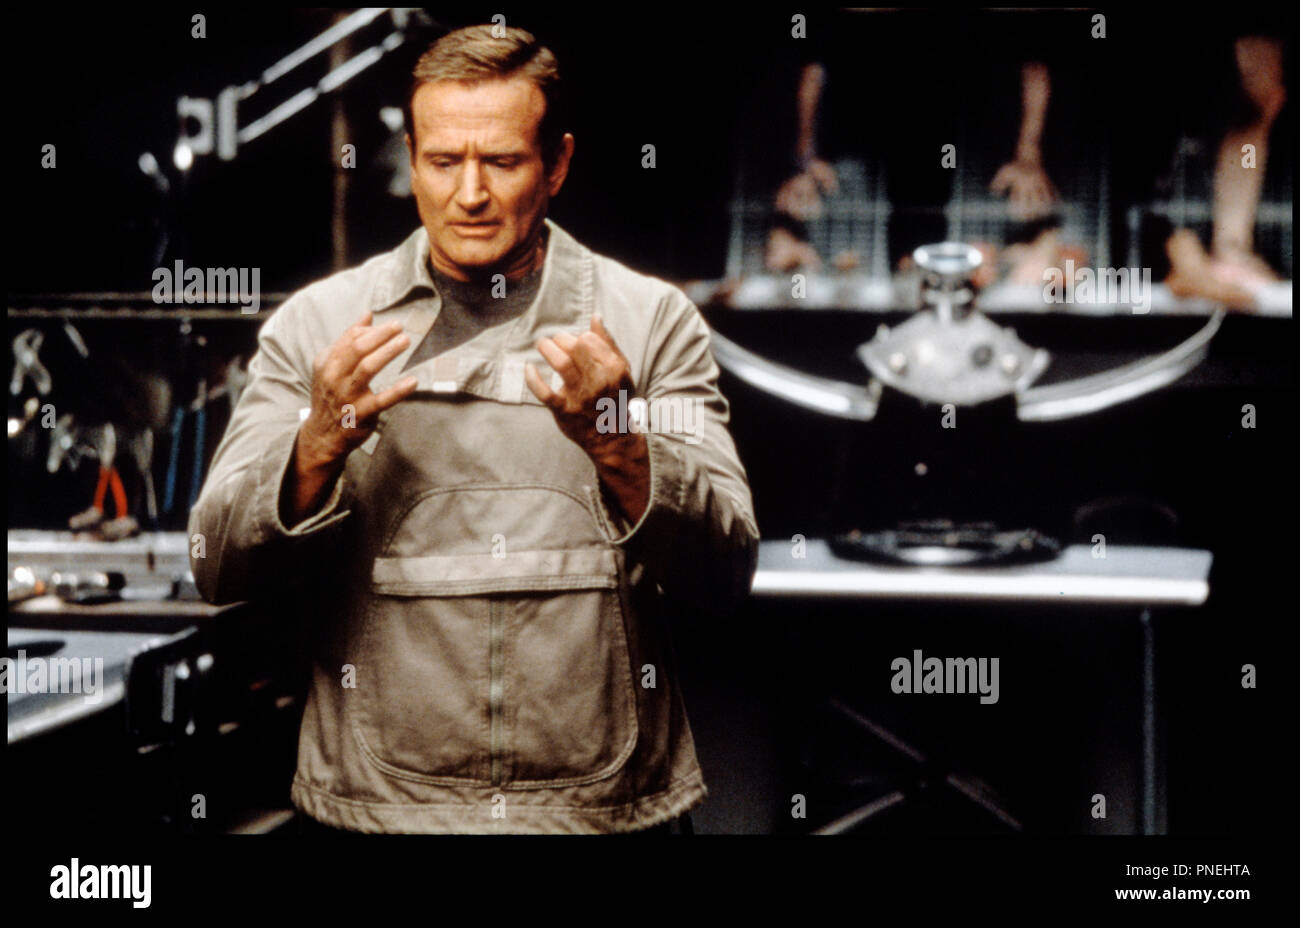 Prod DB © Columbia / DR L'HOMME BICENTENAIRE (BICENTENNIAL MAN) de Chris Columbus 1999 USA avec Robin Williams d'apres le roman de Isaac Asimov - Stock Image